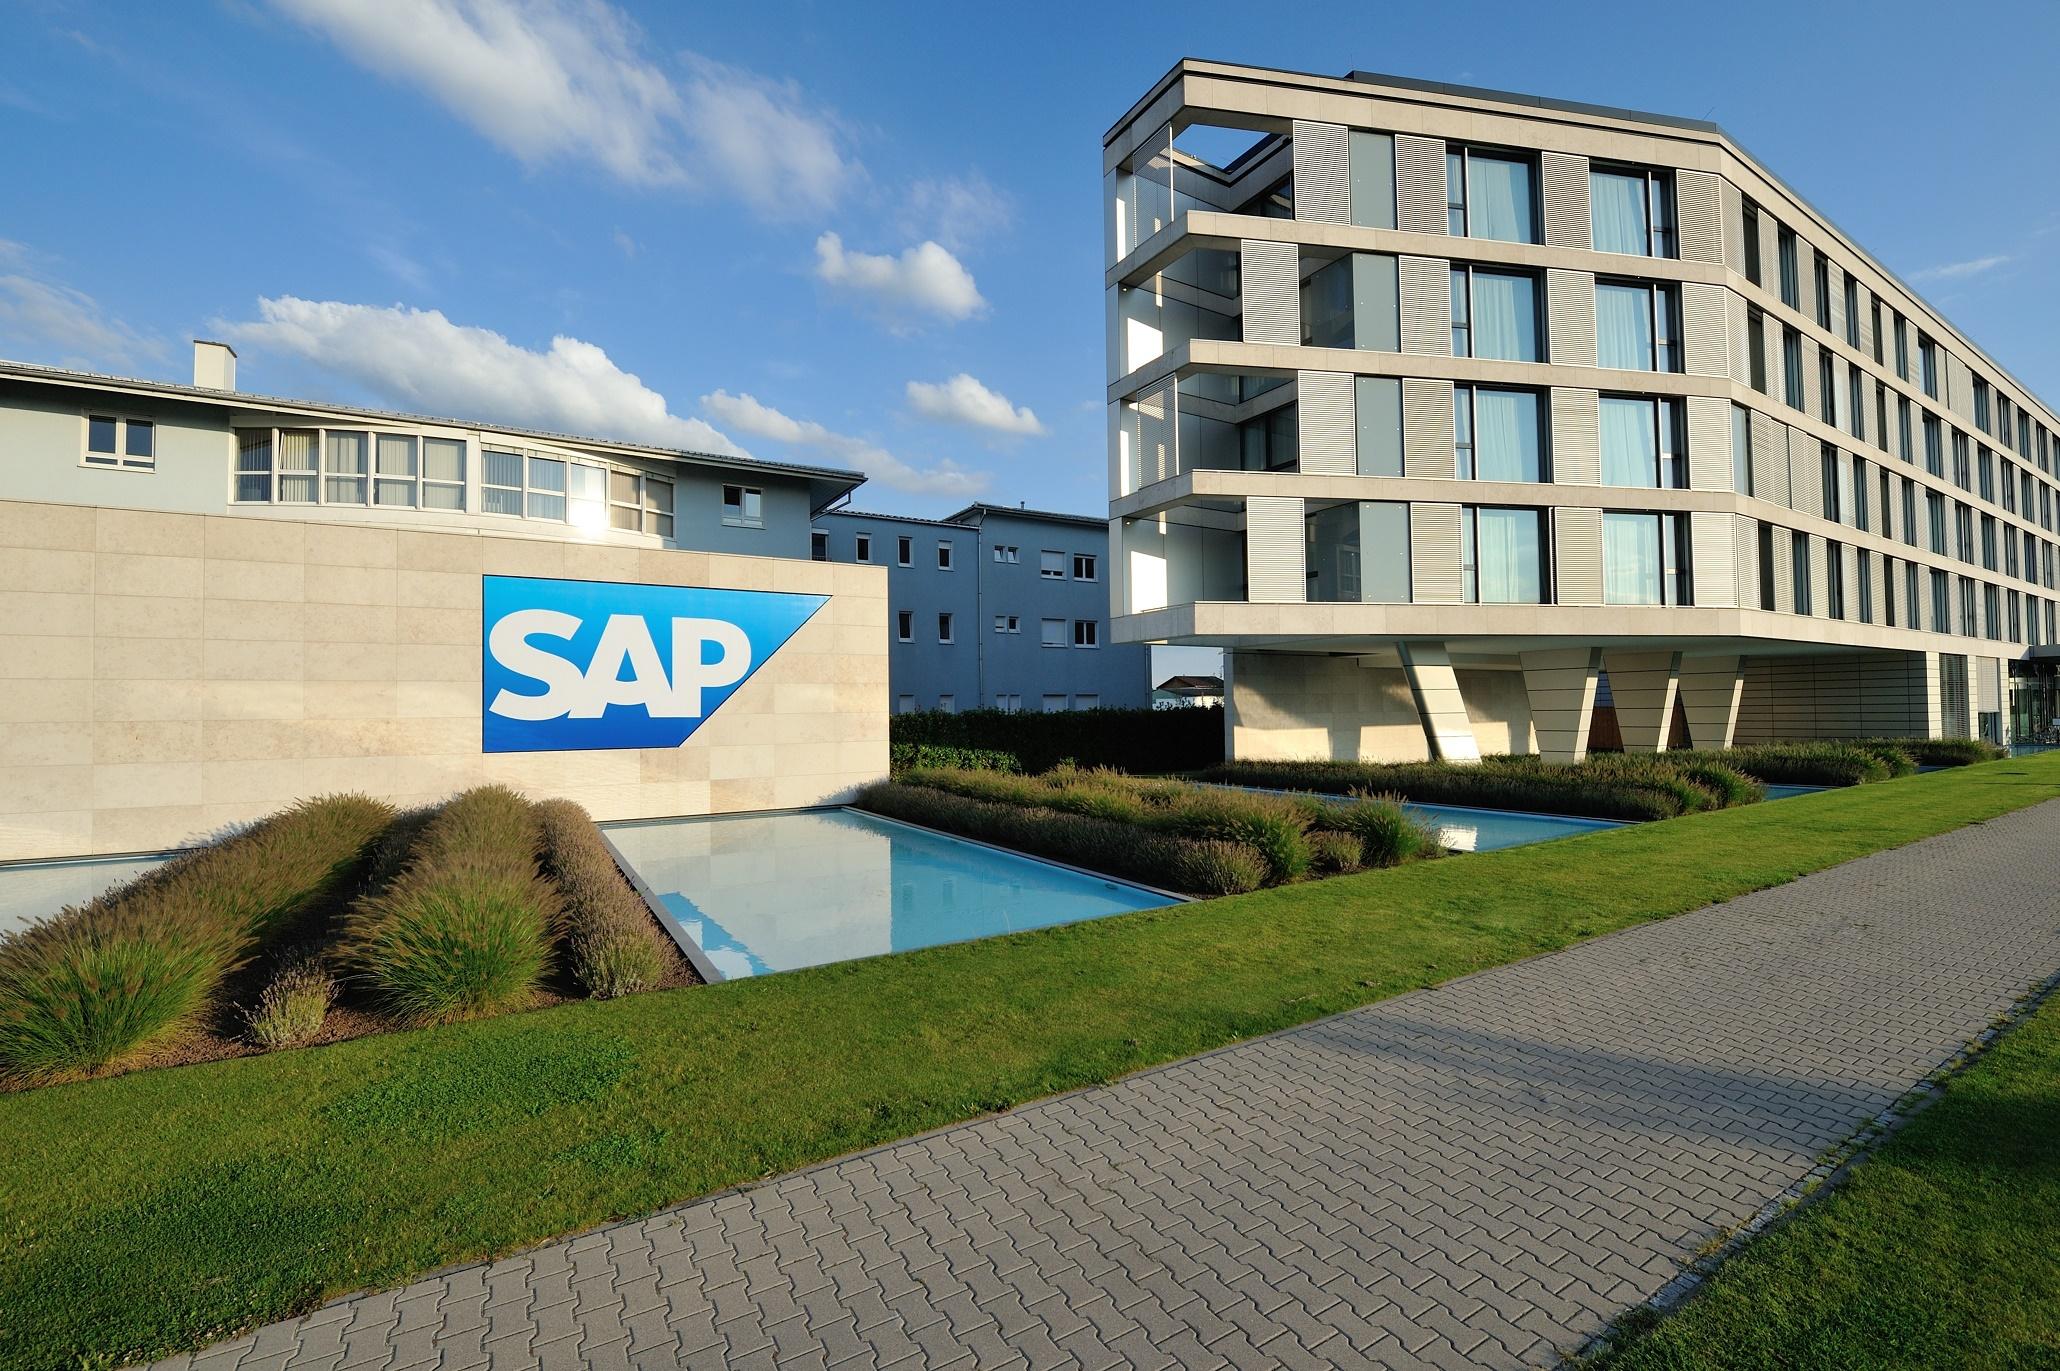 Sapphire Now® anuncia innovaciones que empoderan a clientes